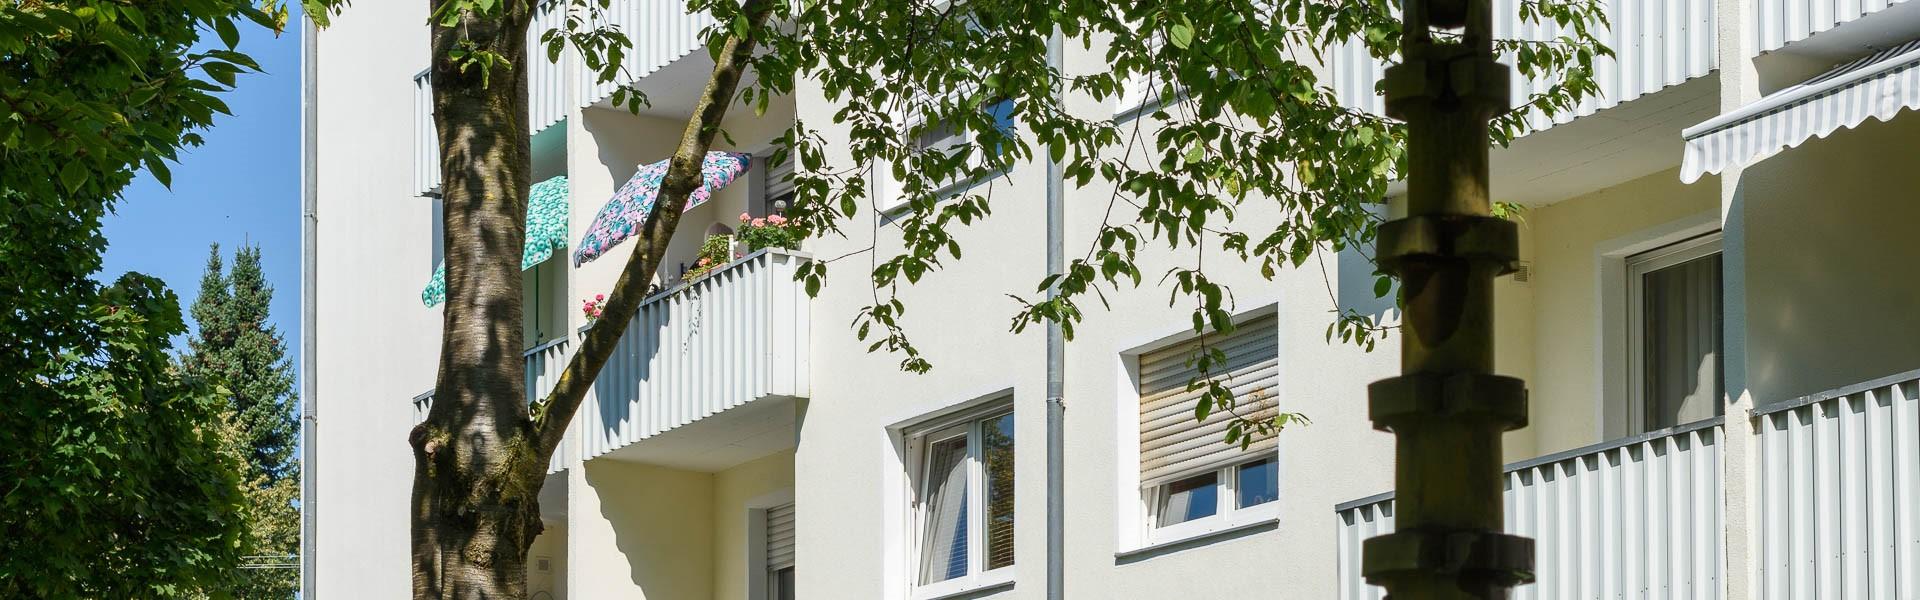 Scherer_Immobilien_Leistershofer-Straße_Augsburg